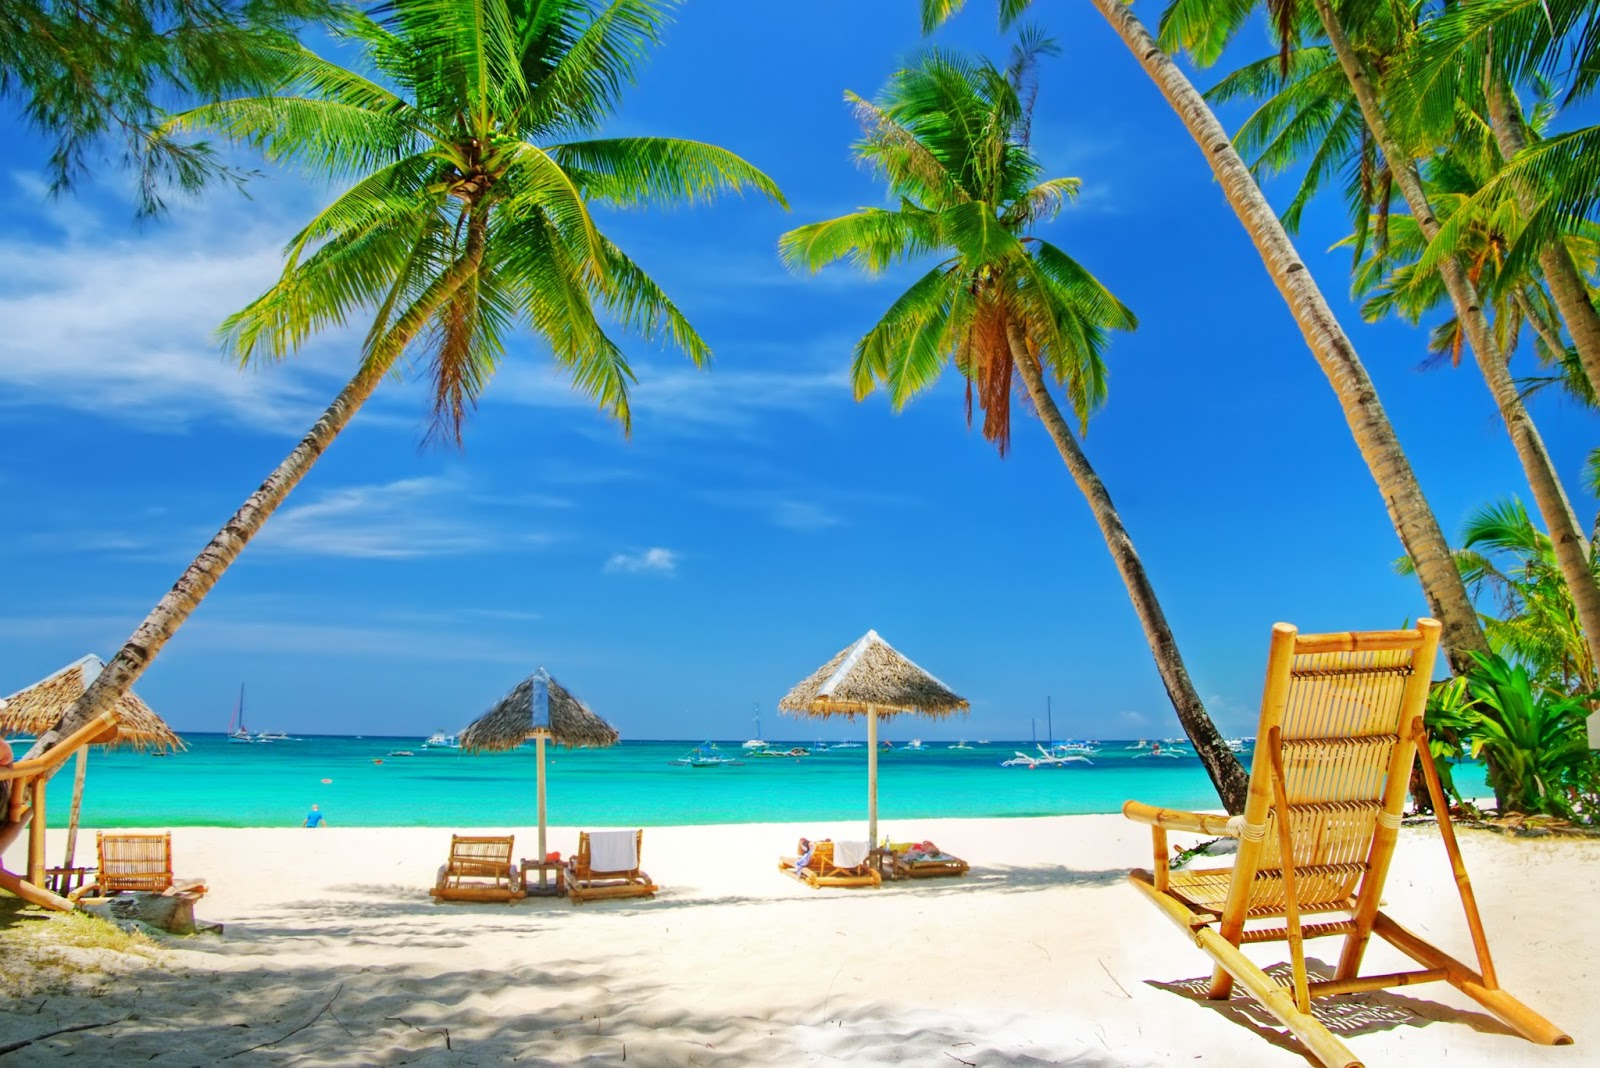 Viajes al Caribe barato